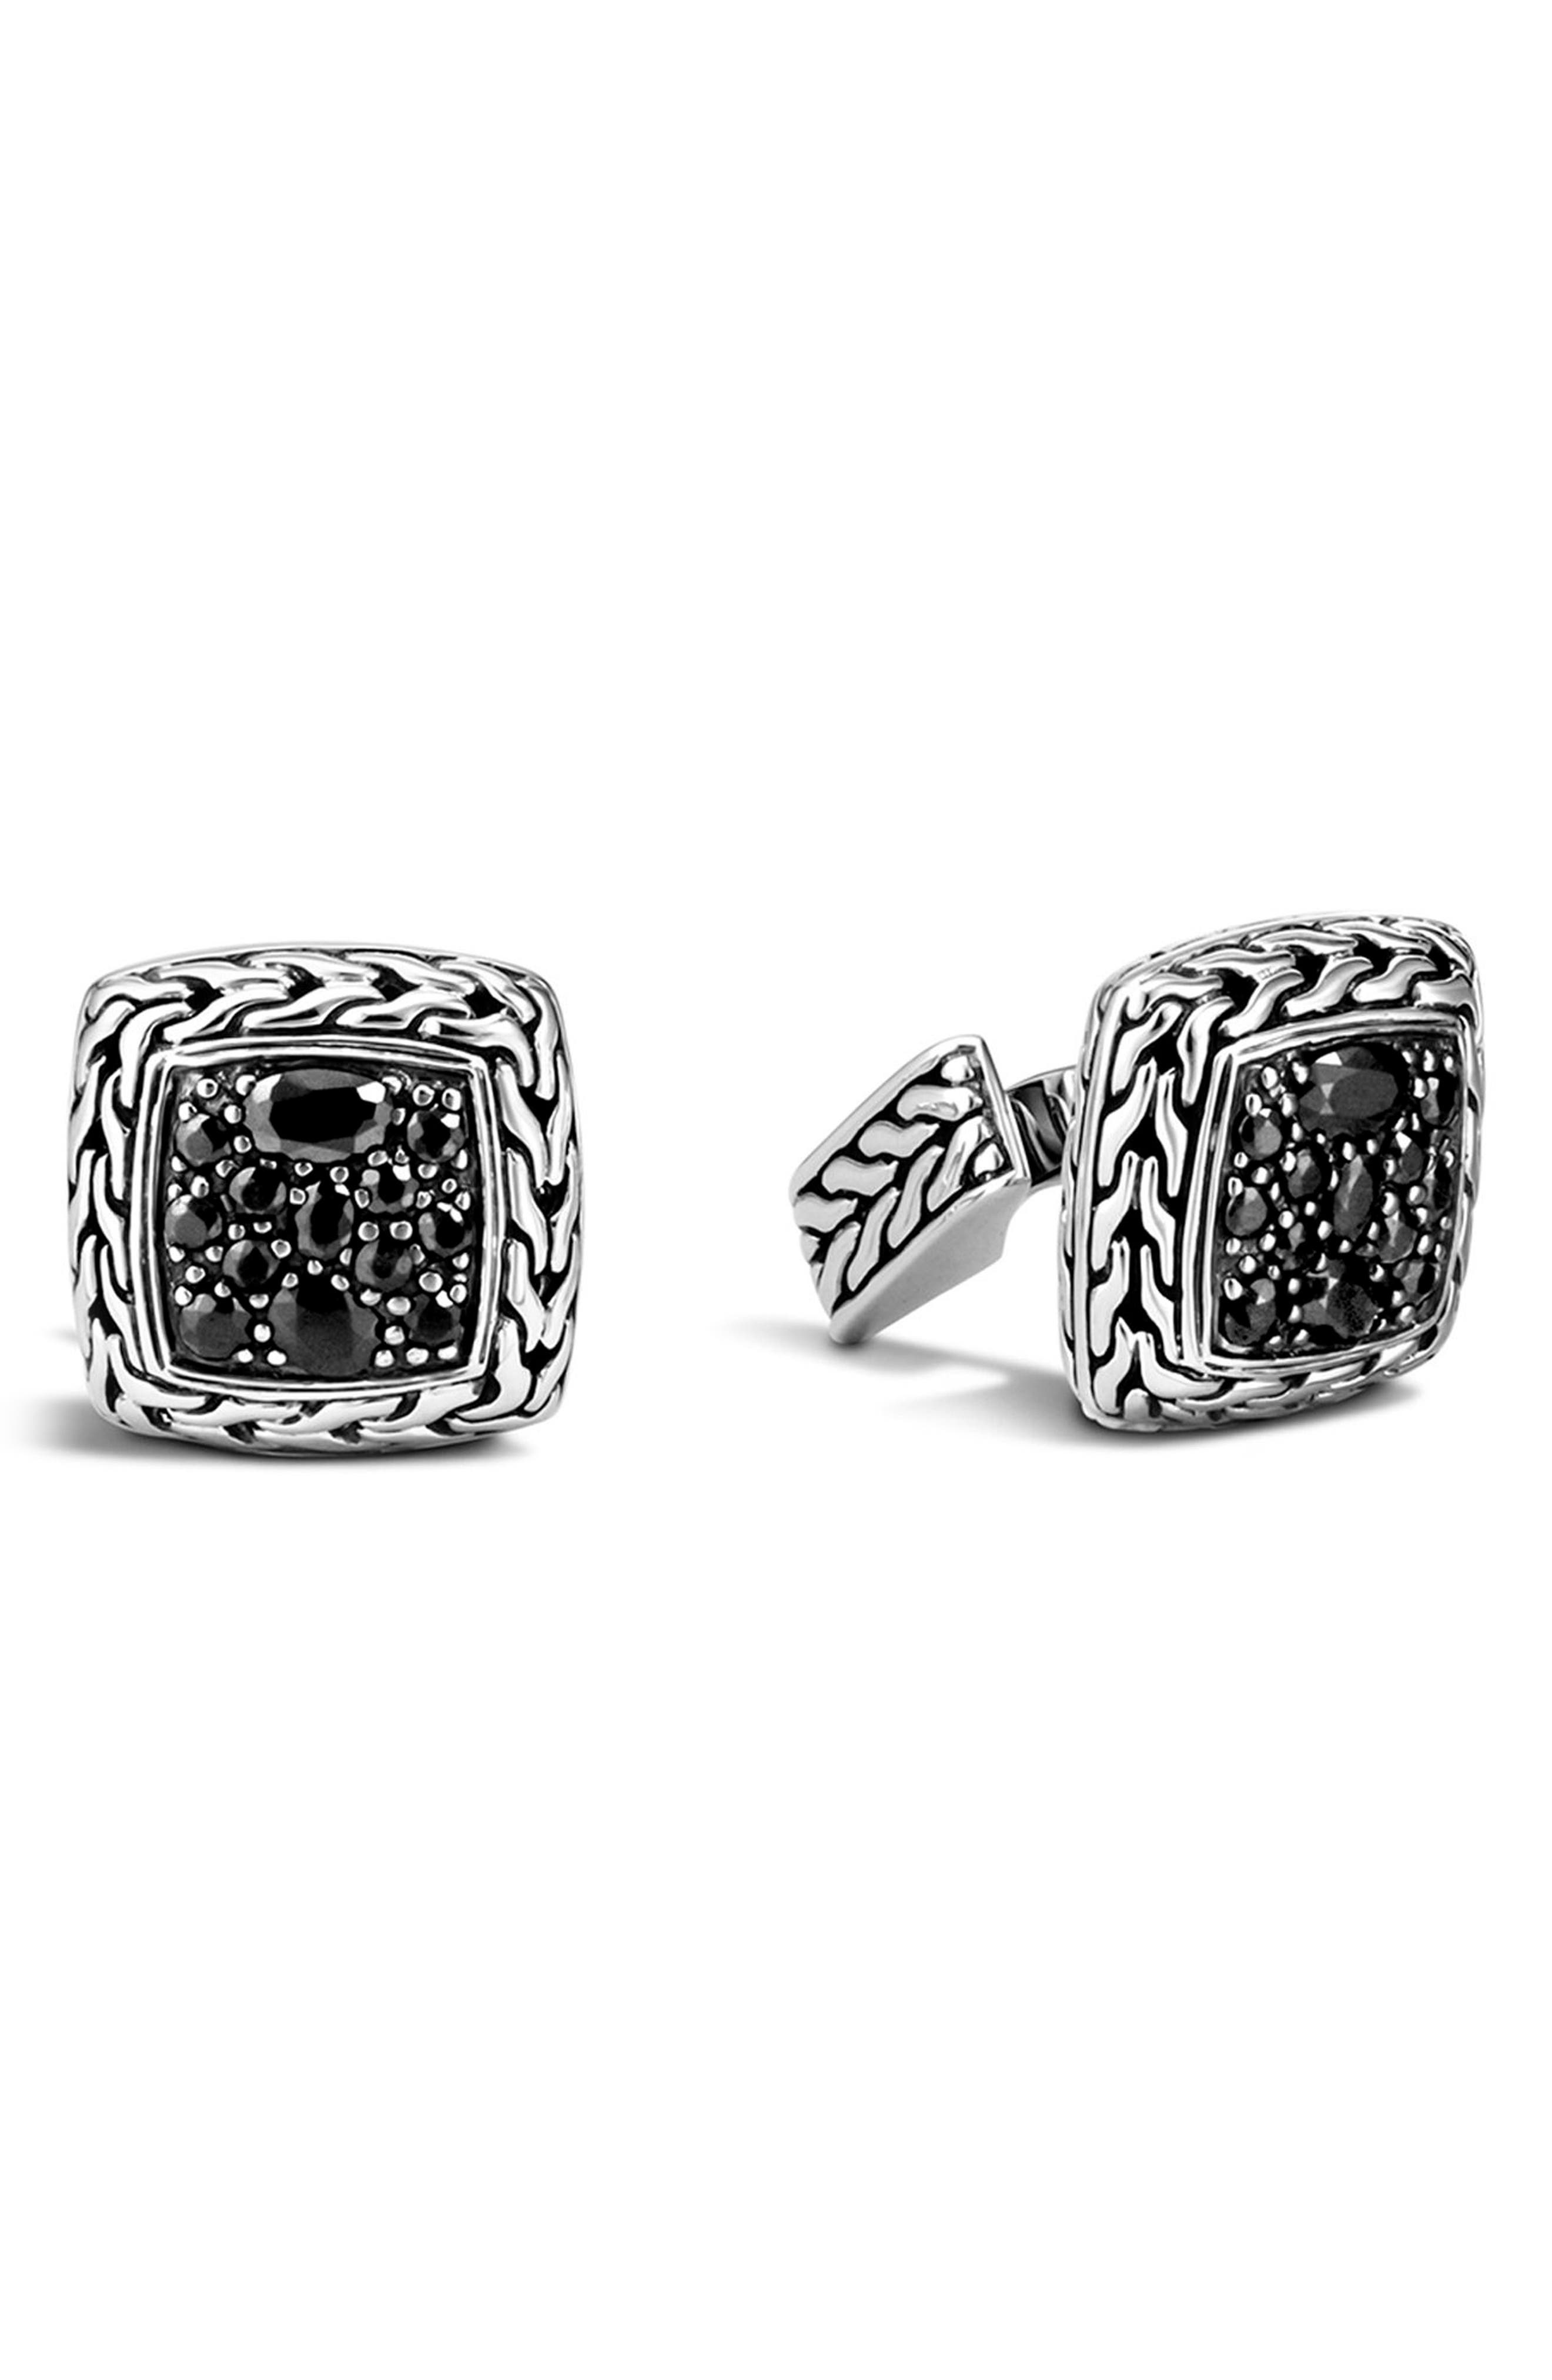 Lava Square Cuff Links,                             Main thumbnail 1, color,                             Silver/ Black Sapphire